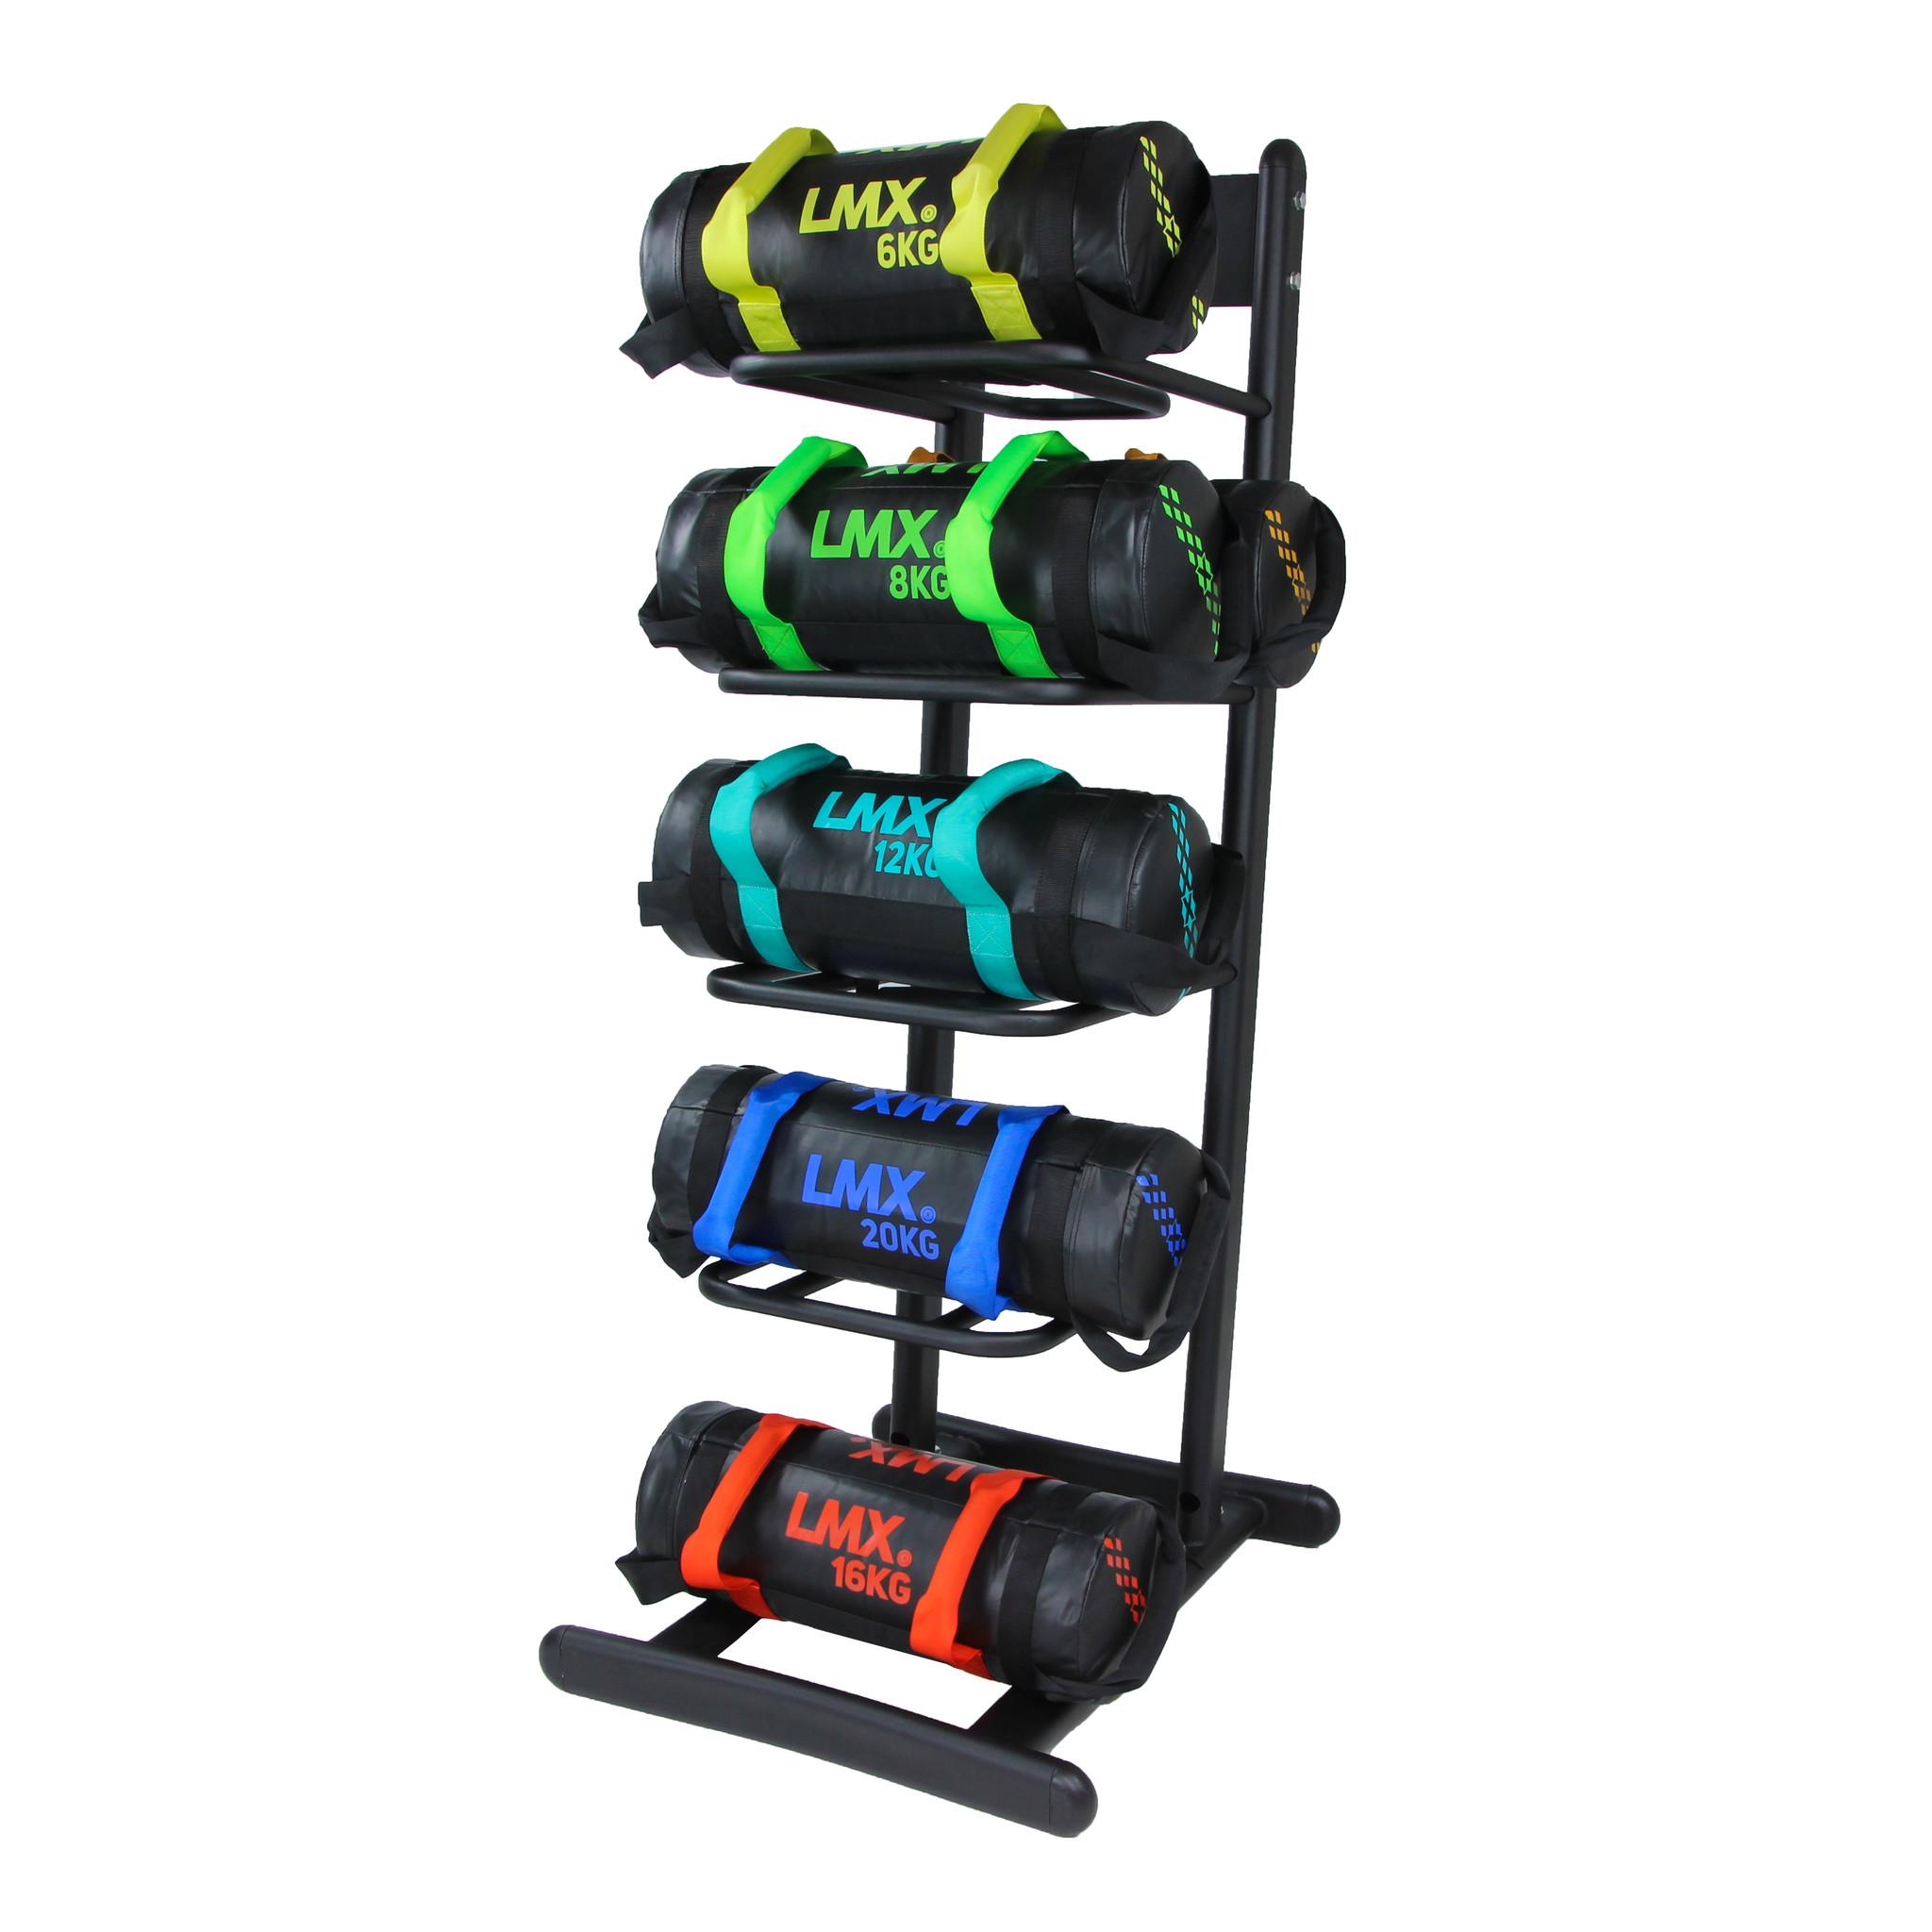 Lifemaxx® LMX1552 Sandbag rack (for 10 bags)